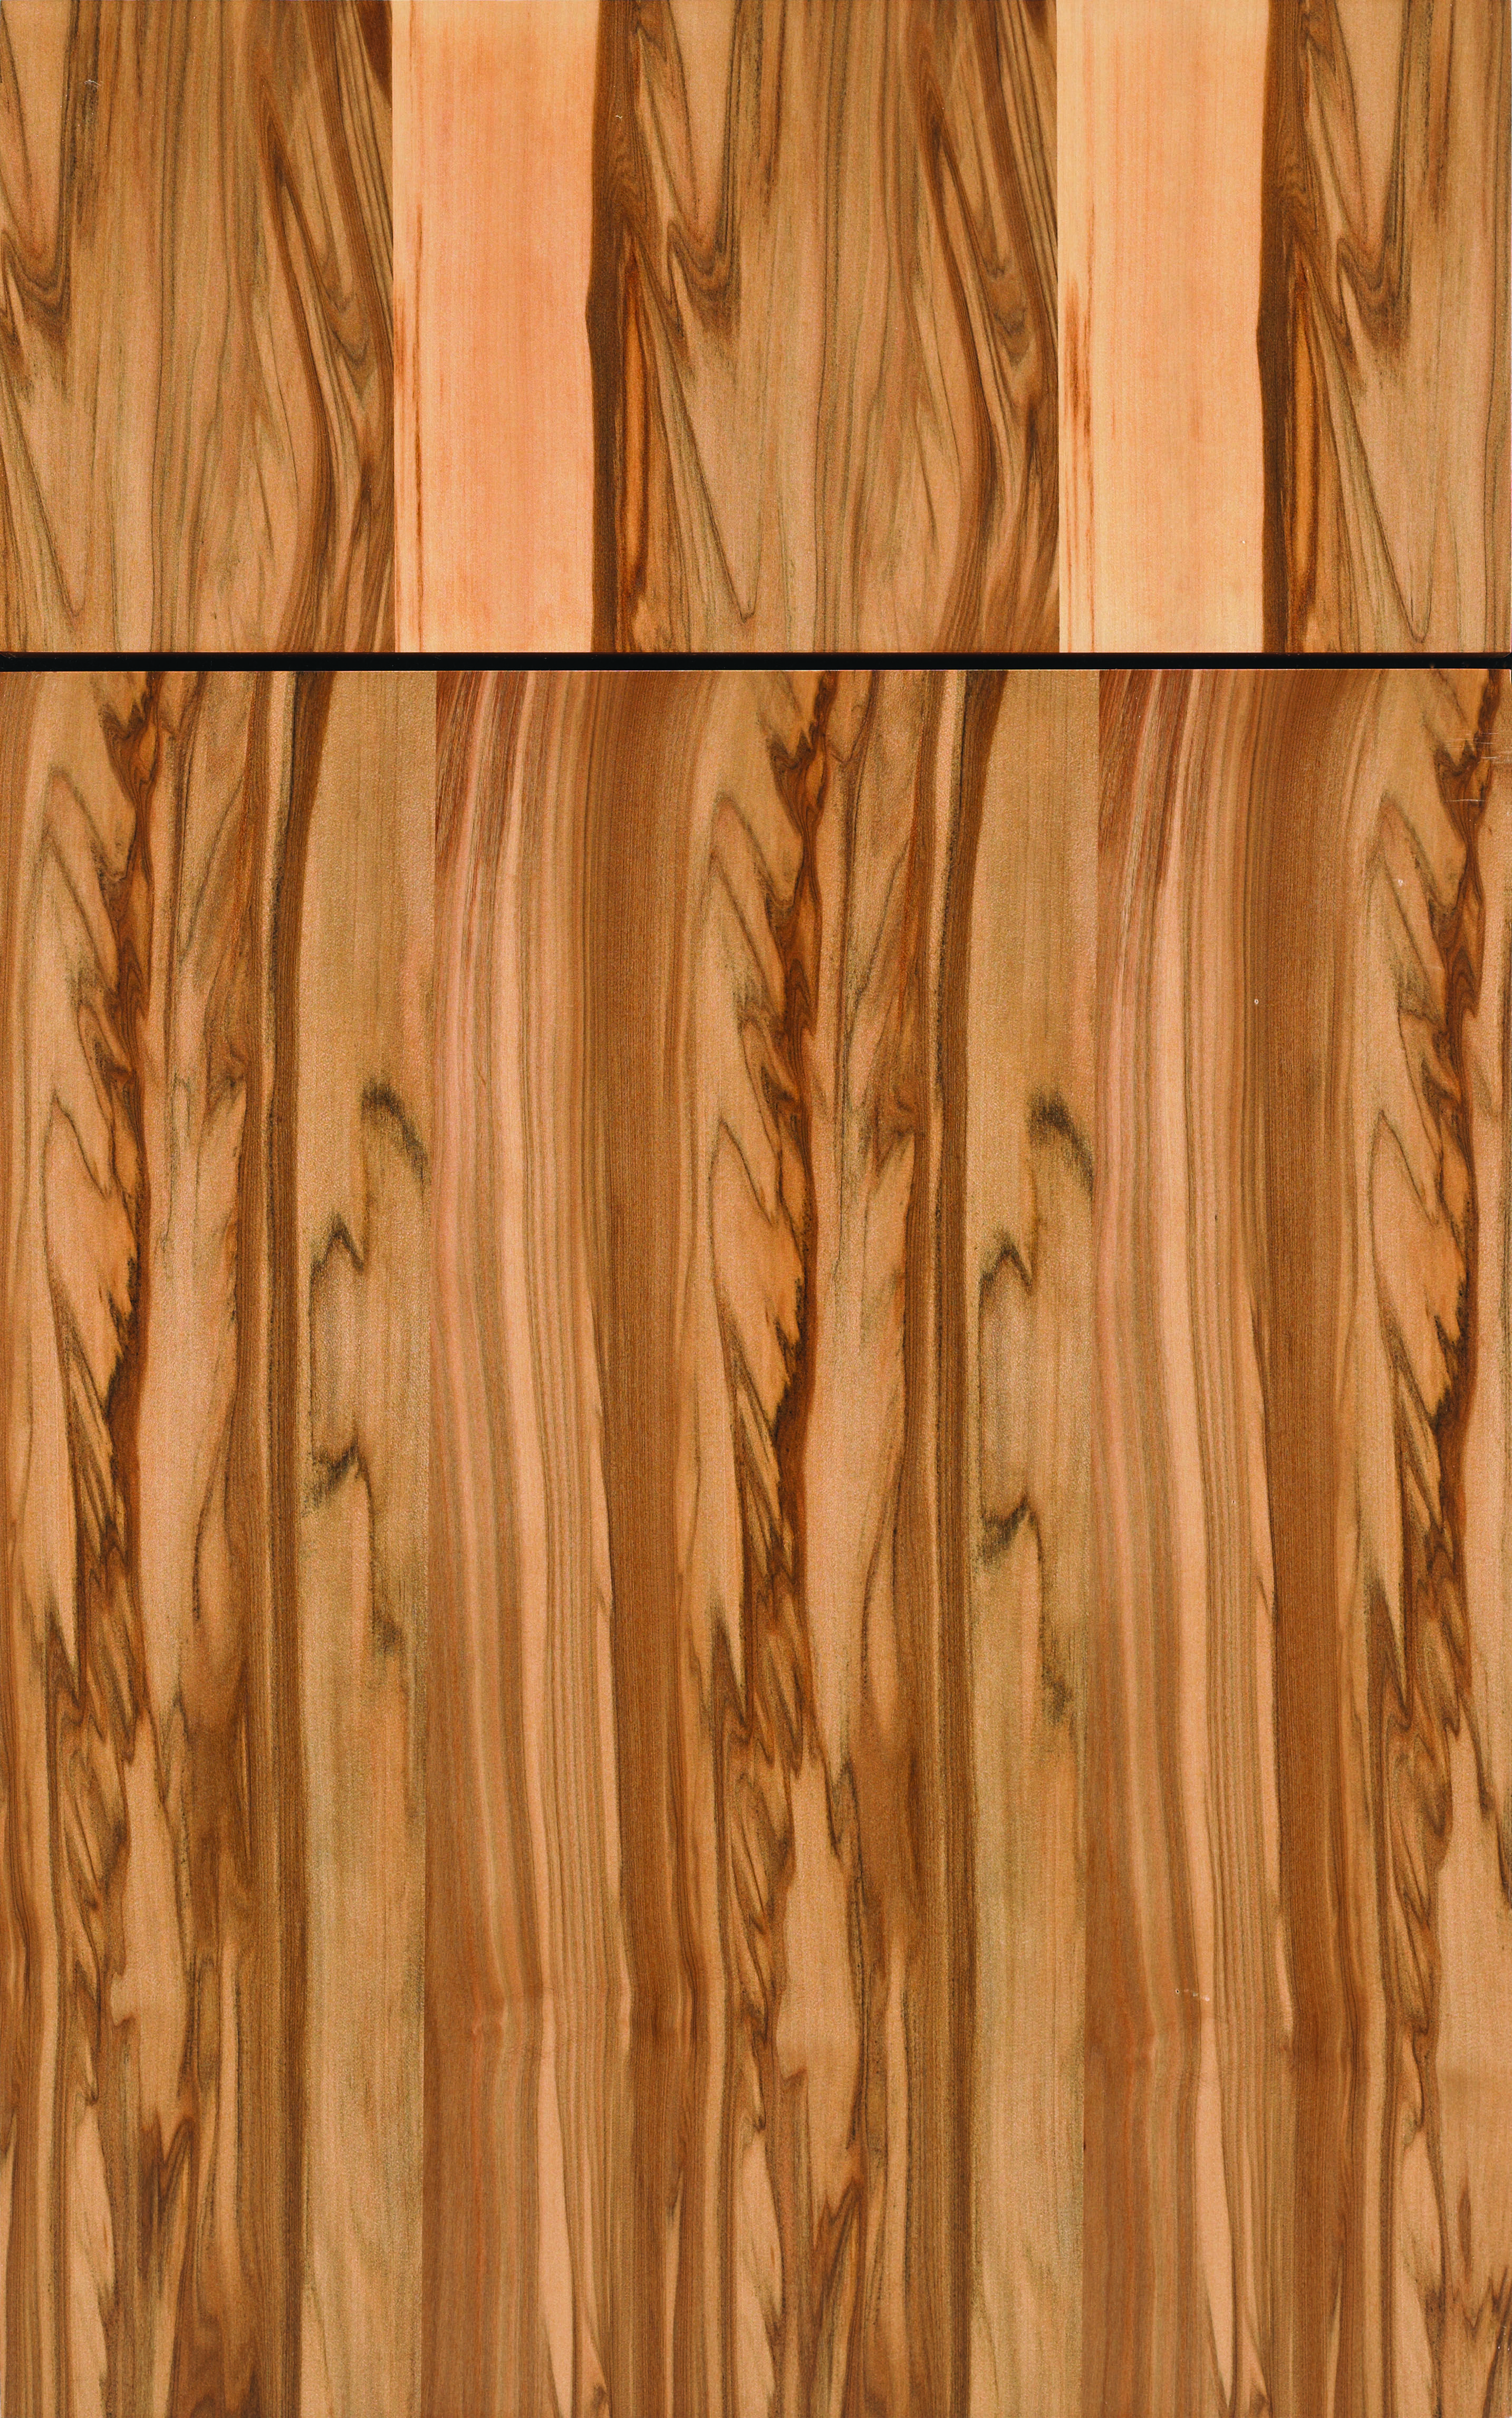 Red Gum Holz : red gum wood grain wood pinterest ~ Frokenaadalensverden.com Haus und Dekorationen